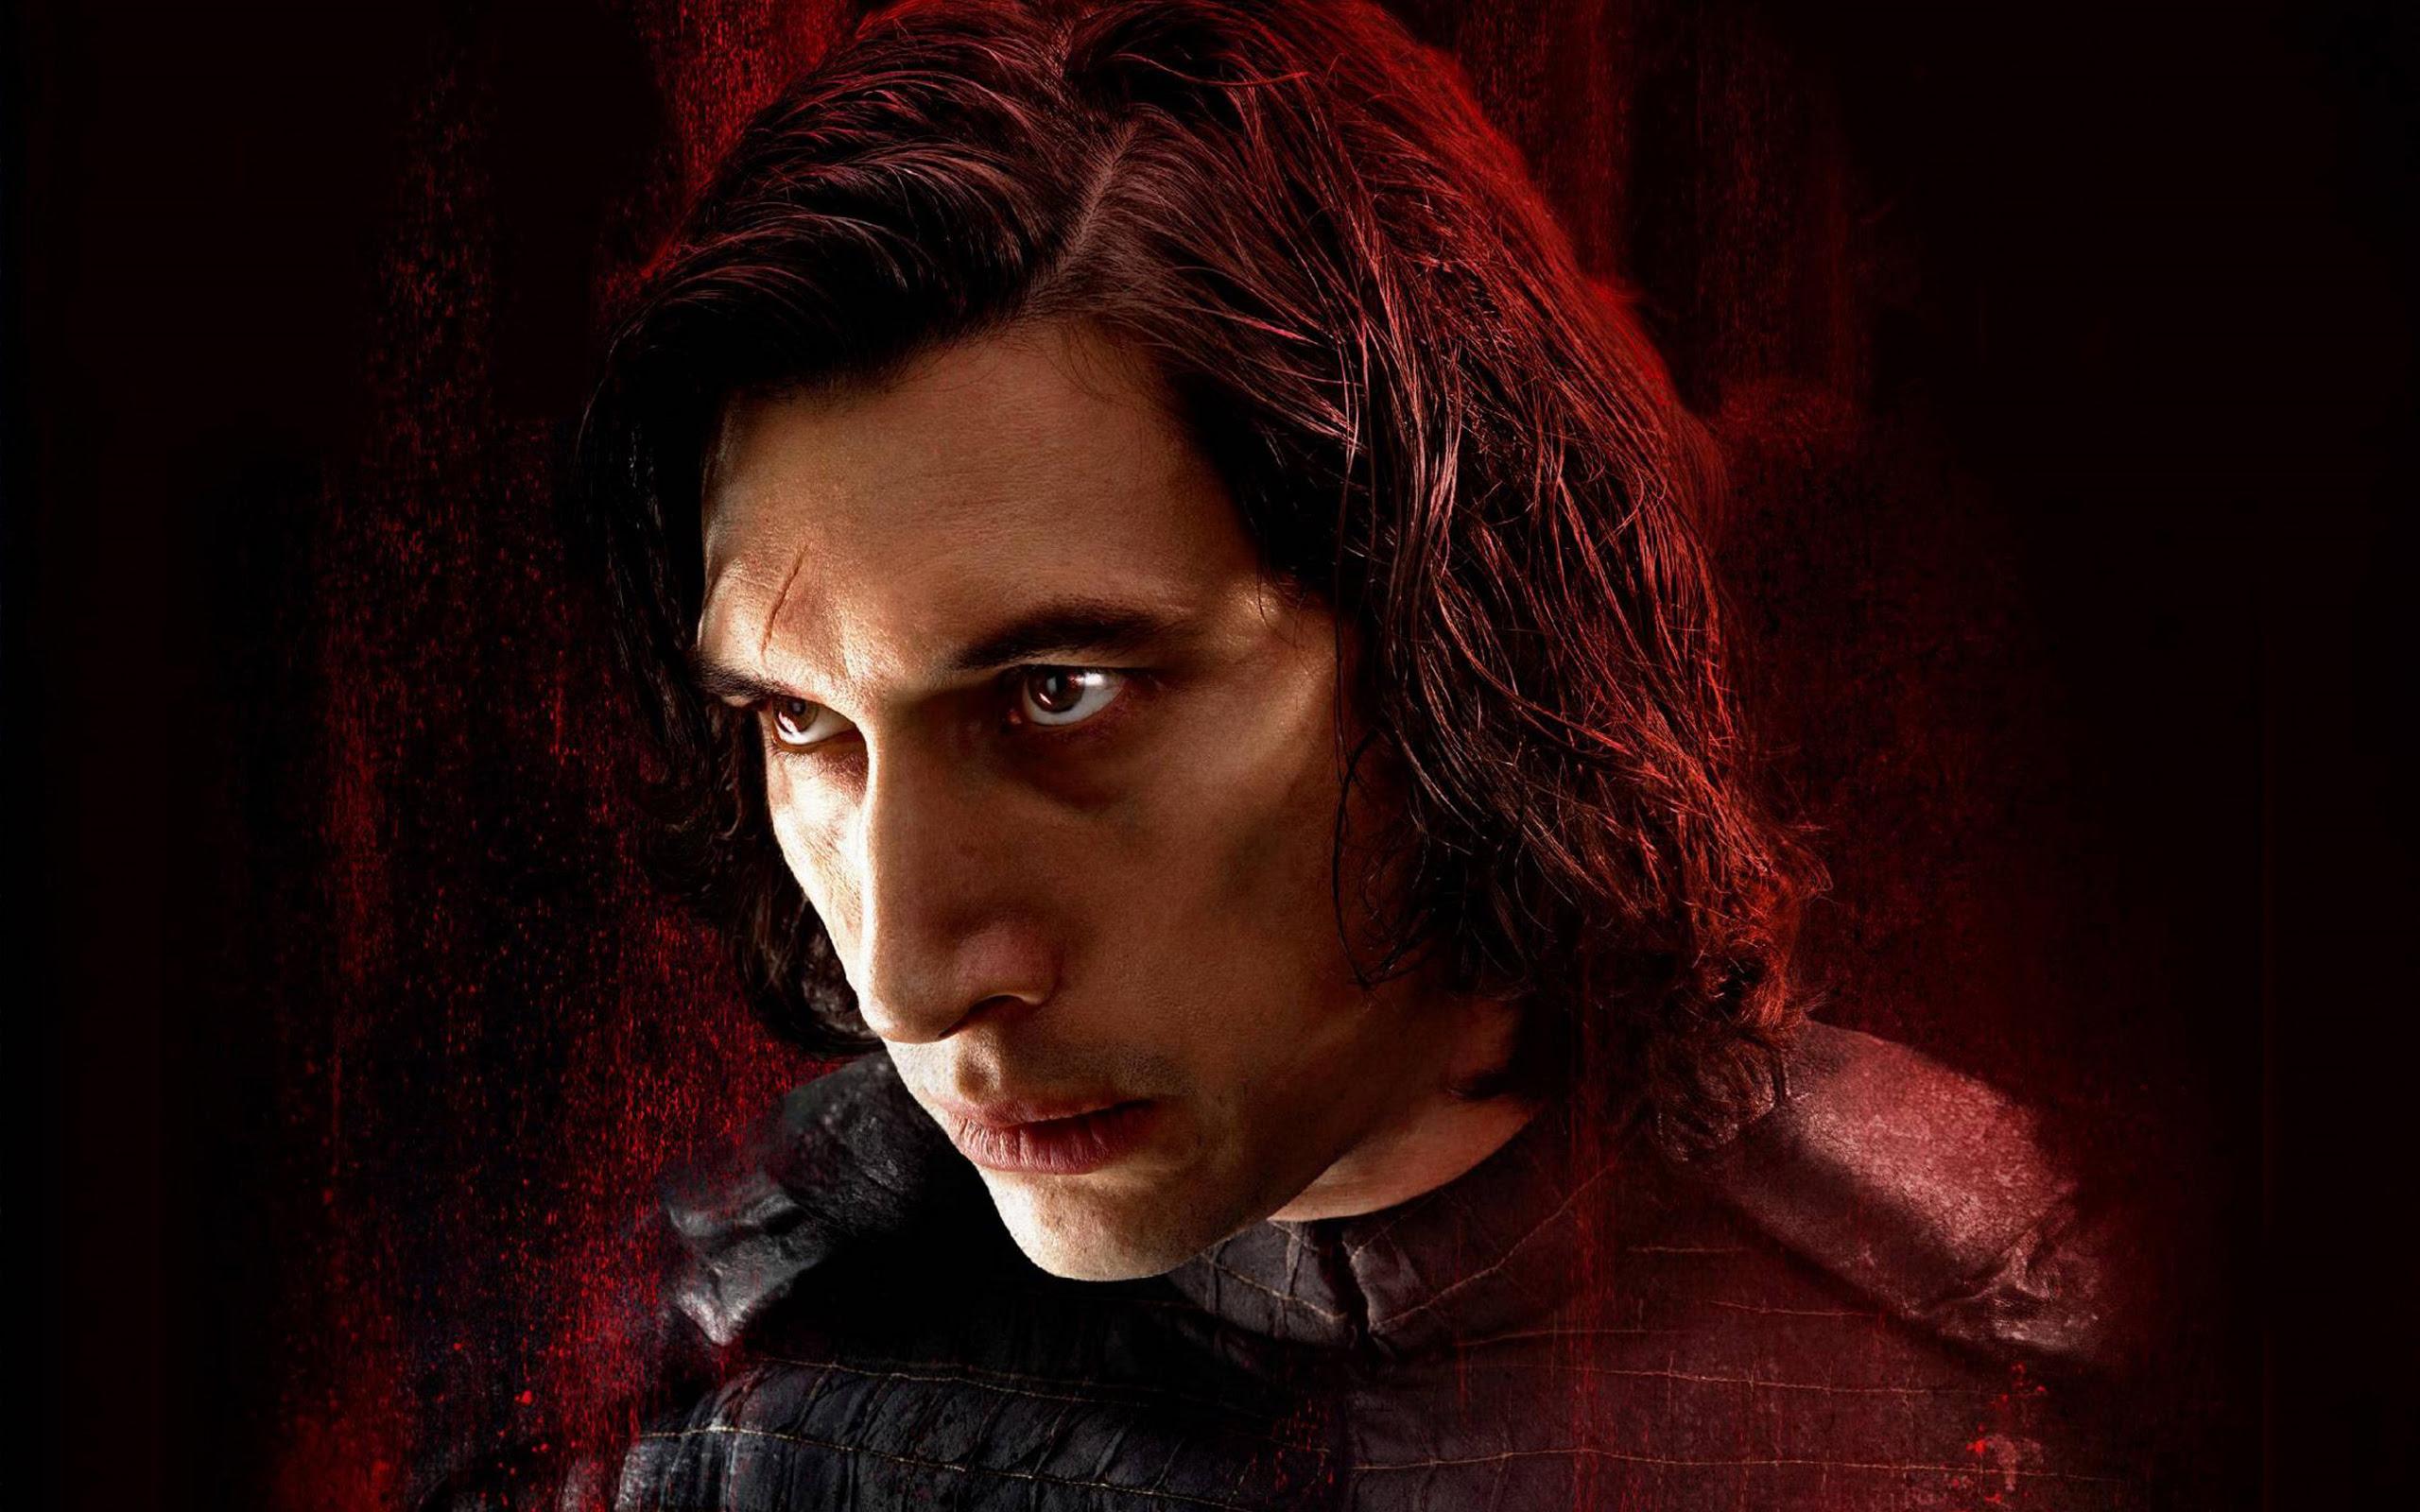 Adam Driver As Kylo Ren In Star Wars The Last Jedi Wallpapers Hd